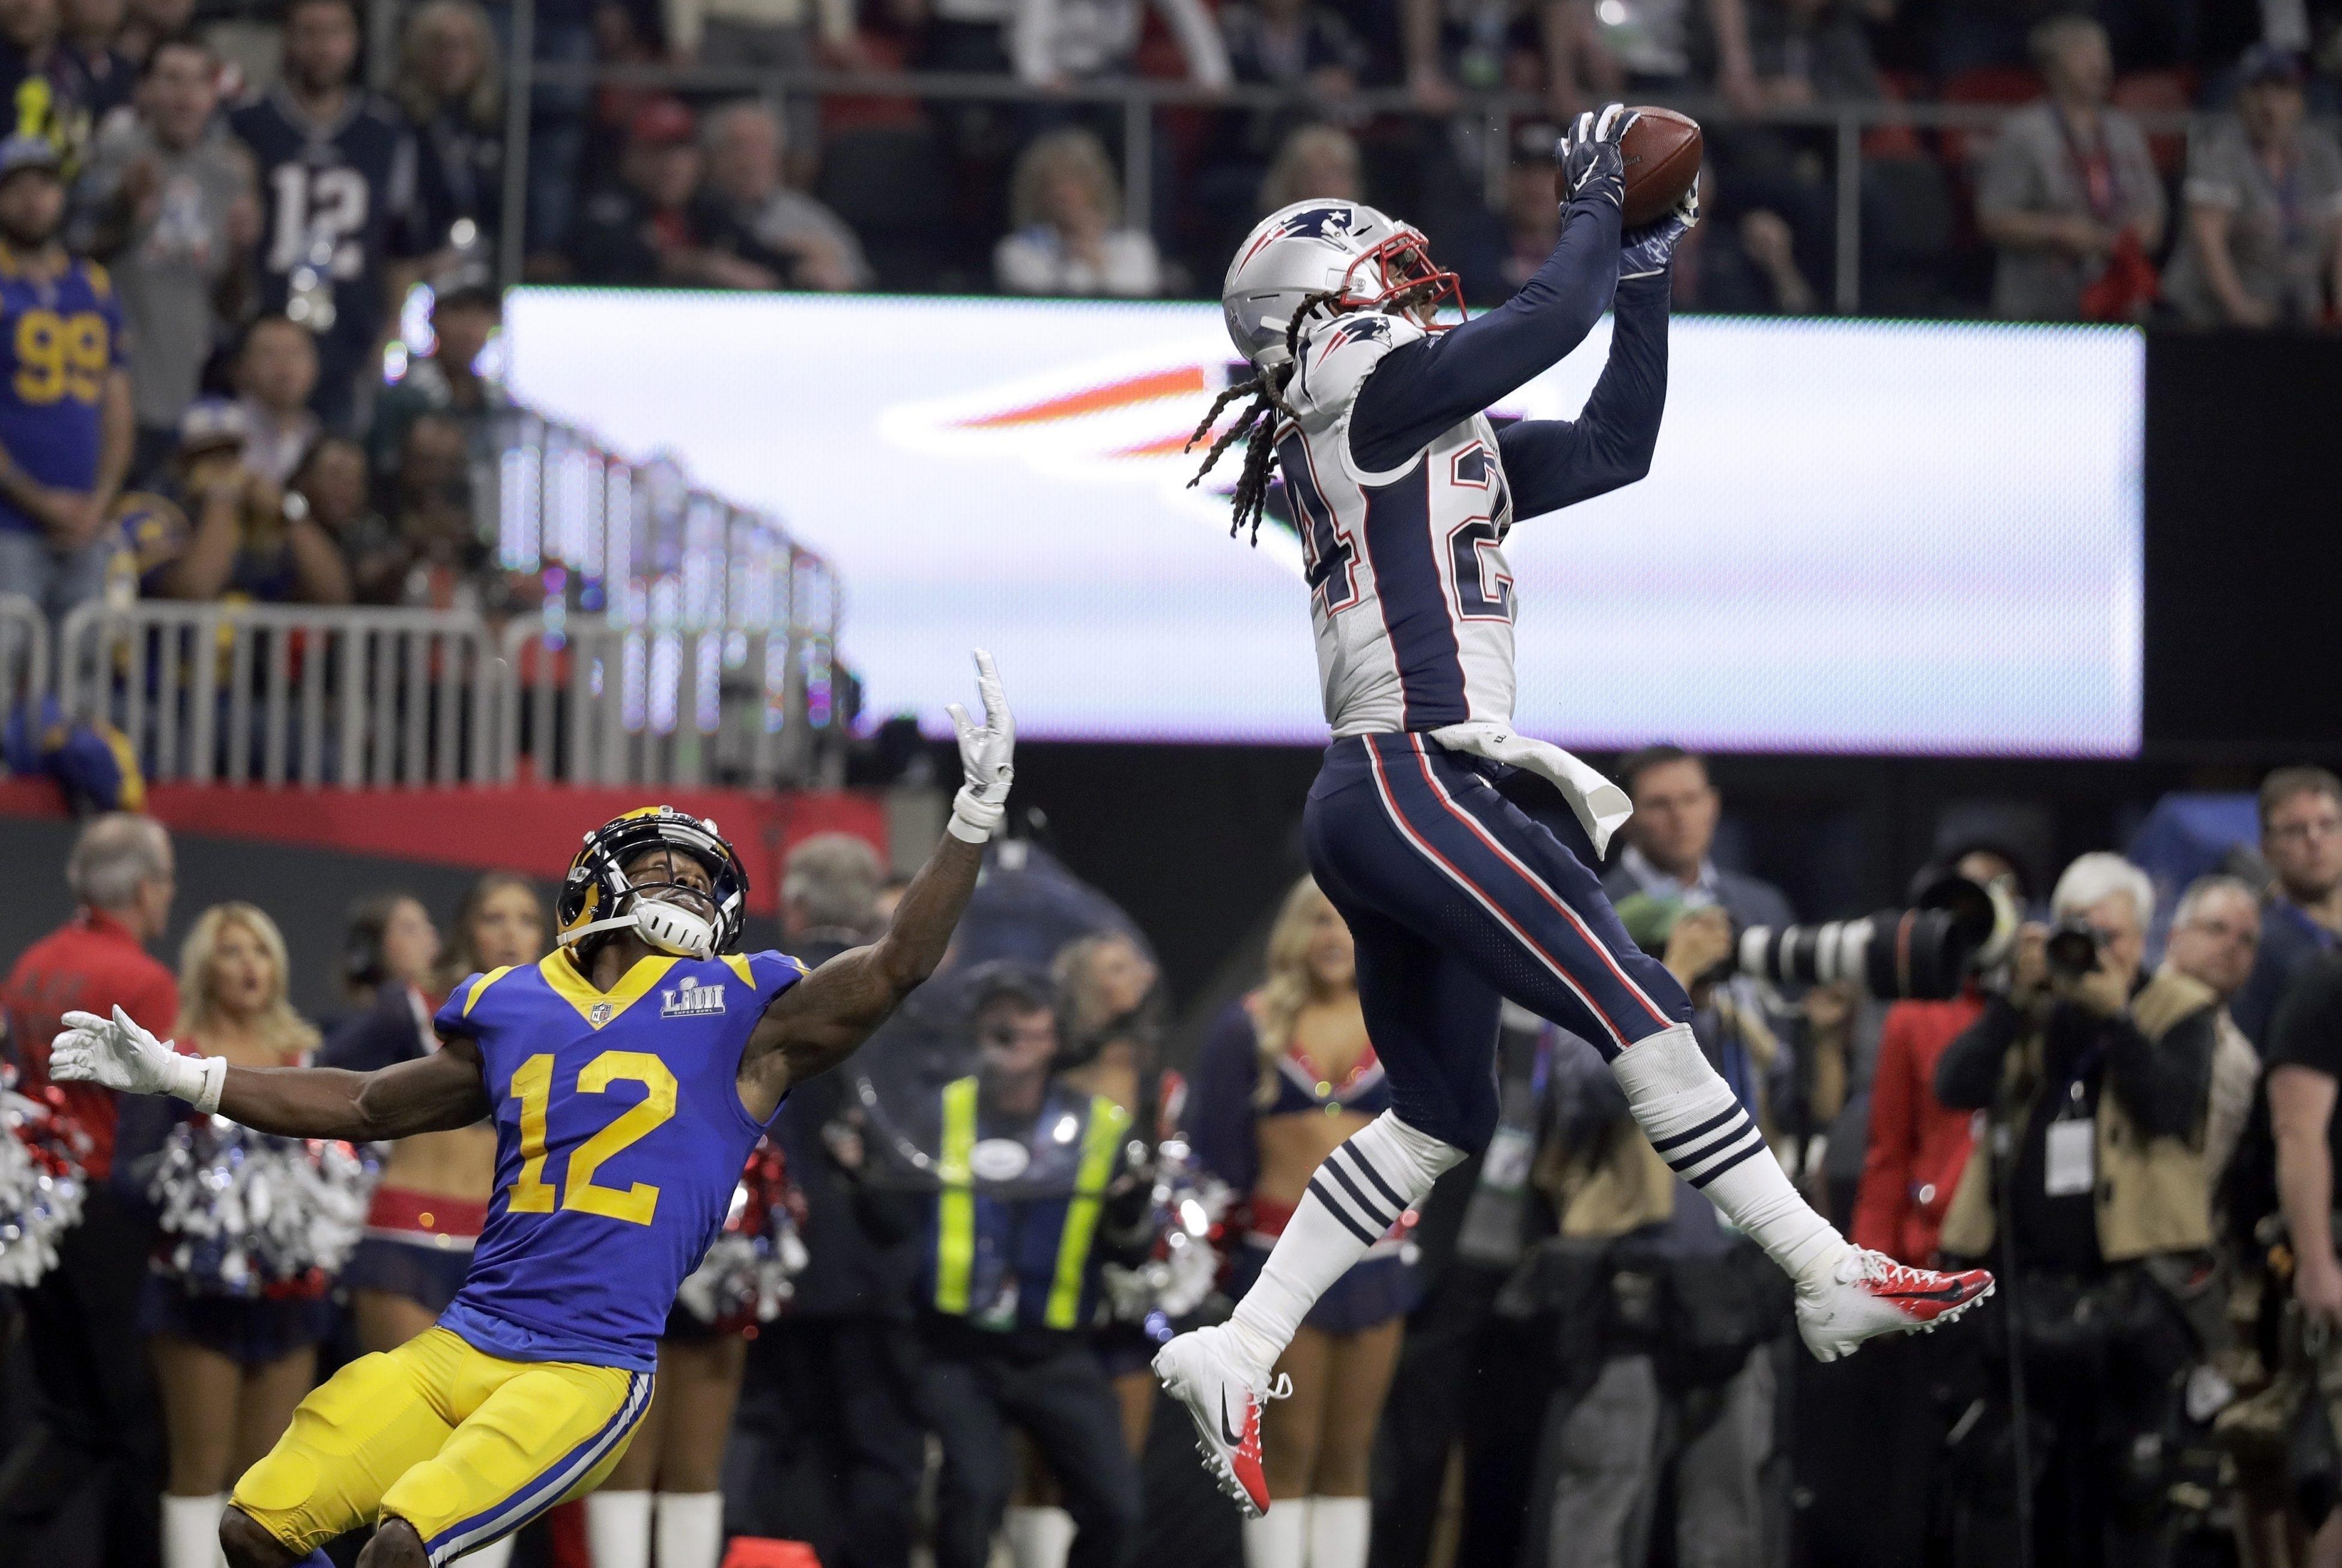 Patriots Defeat Rams 13-3 In Lowest-Scoring Super Bowl Ever intended for Lowest Scoring Super Bowl Ever